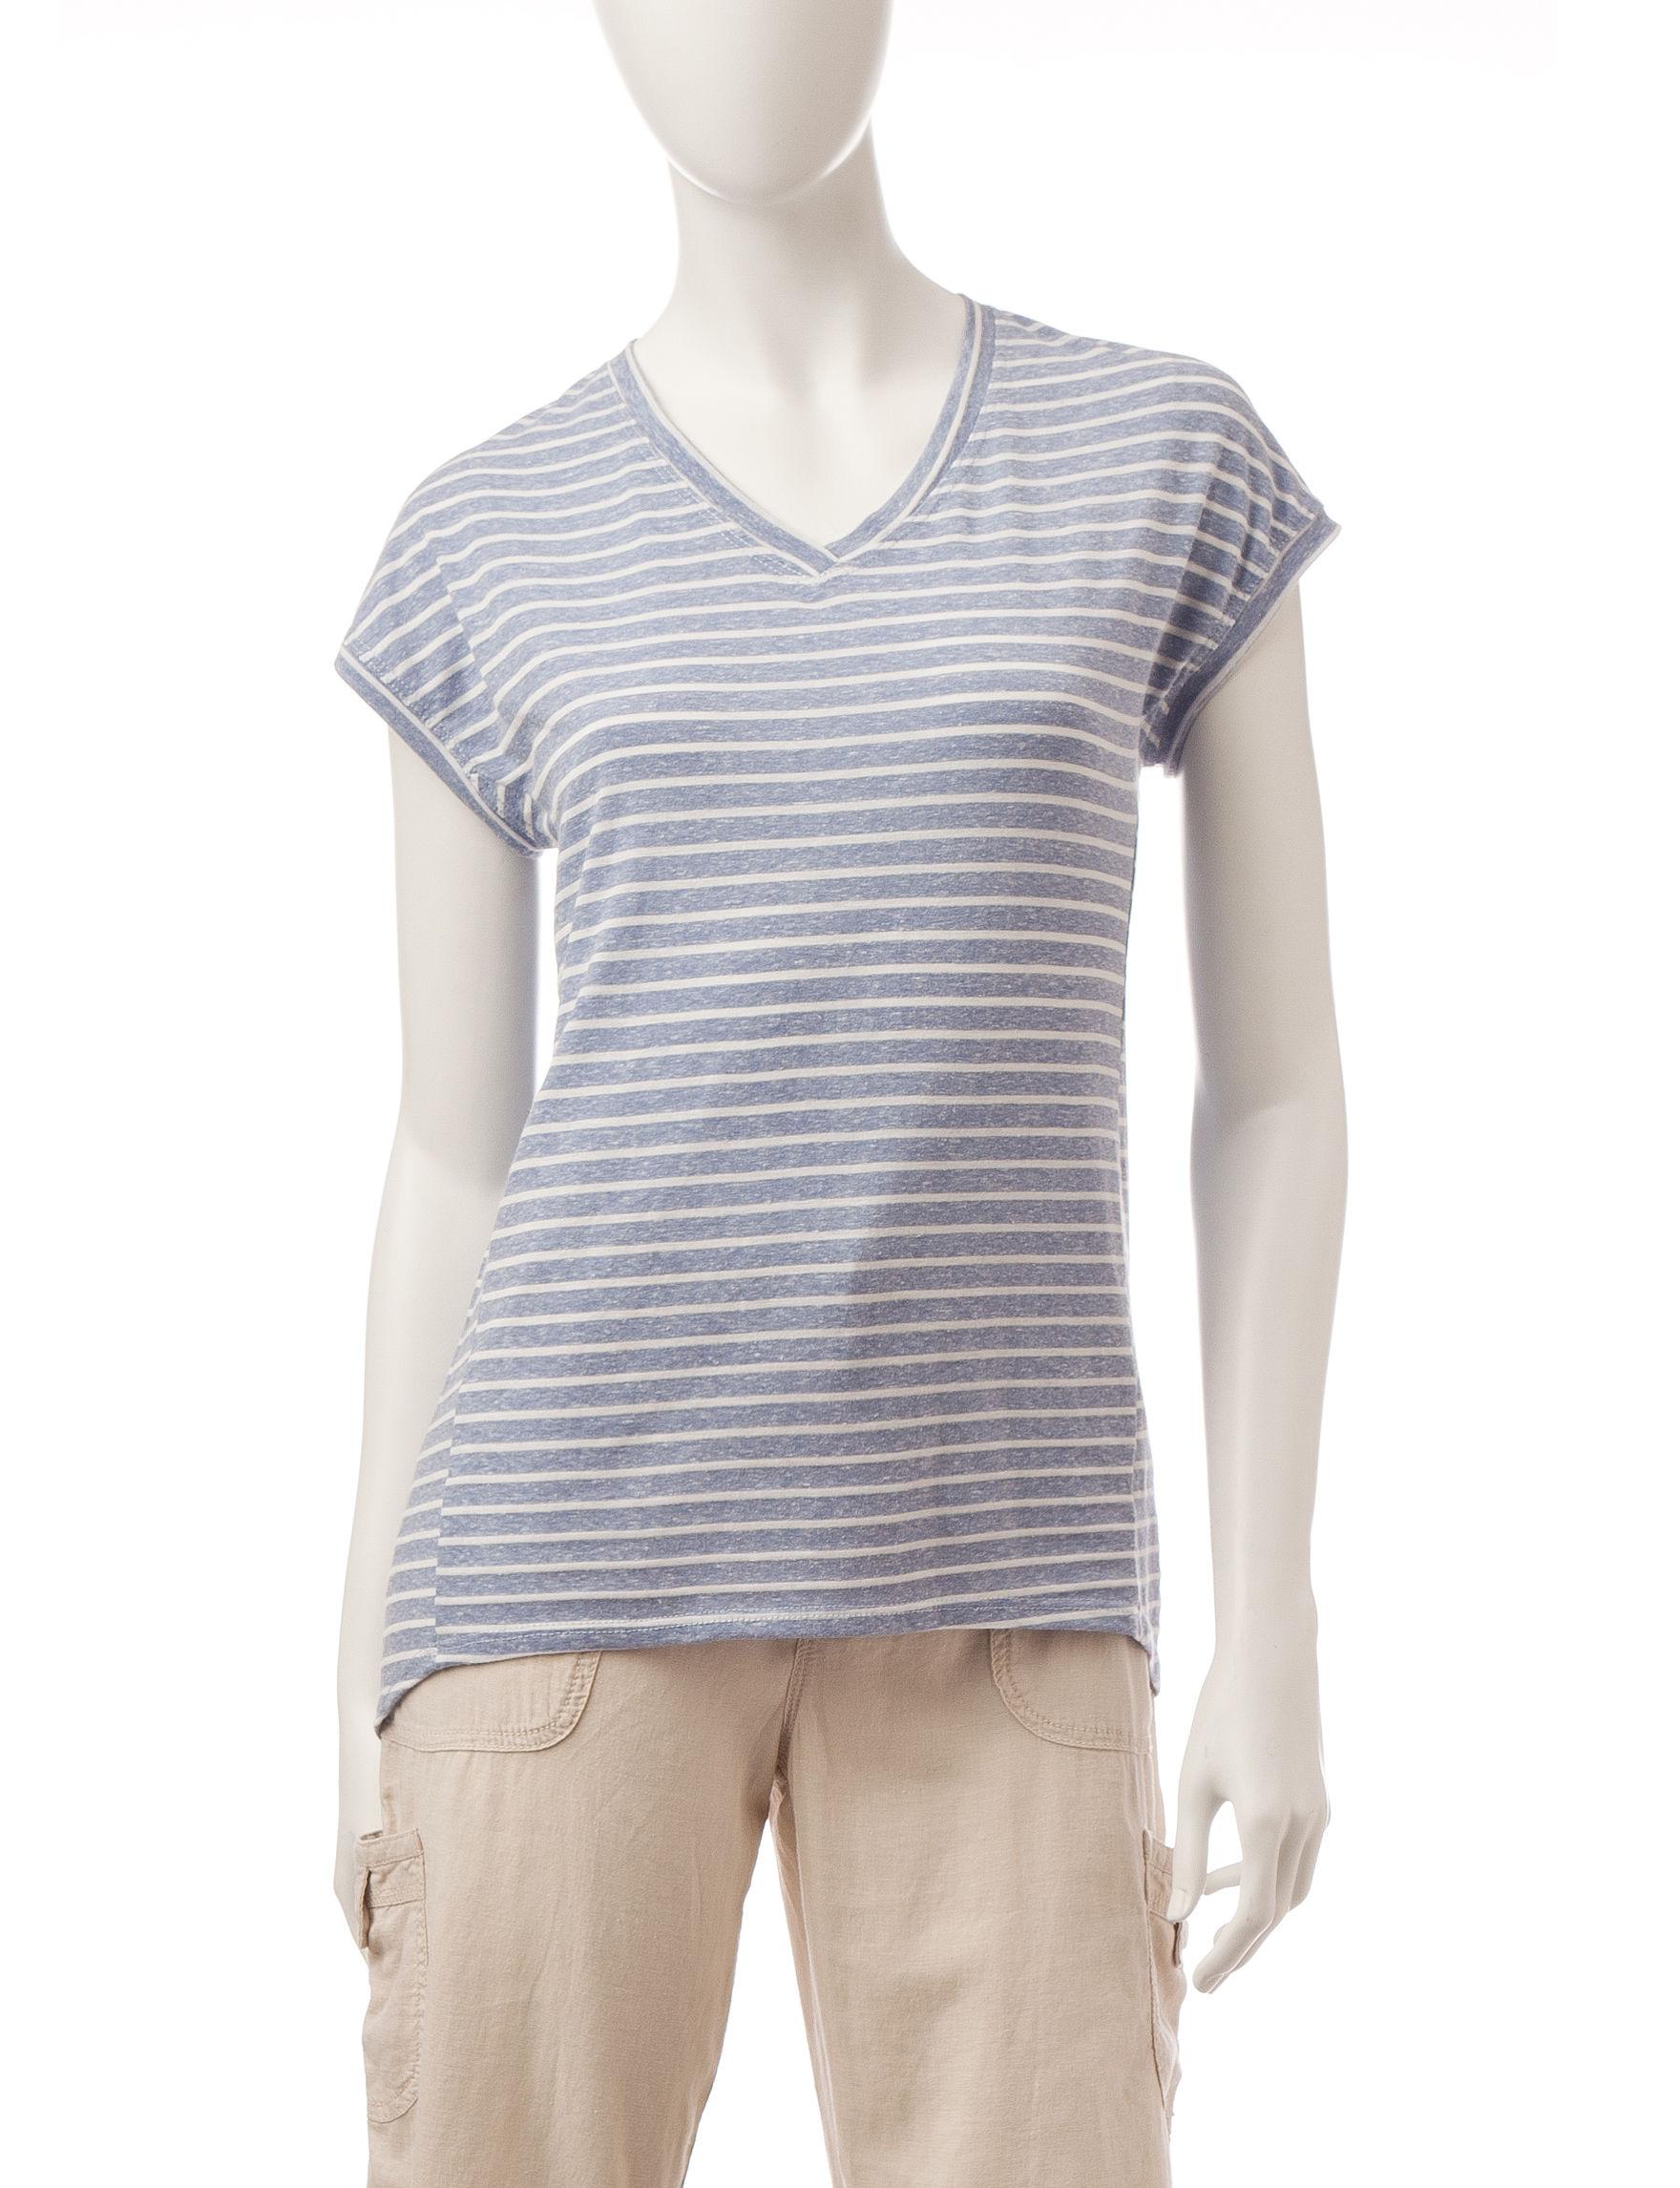 Silverwear Blue / White Tees & Tanks